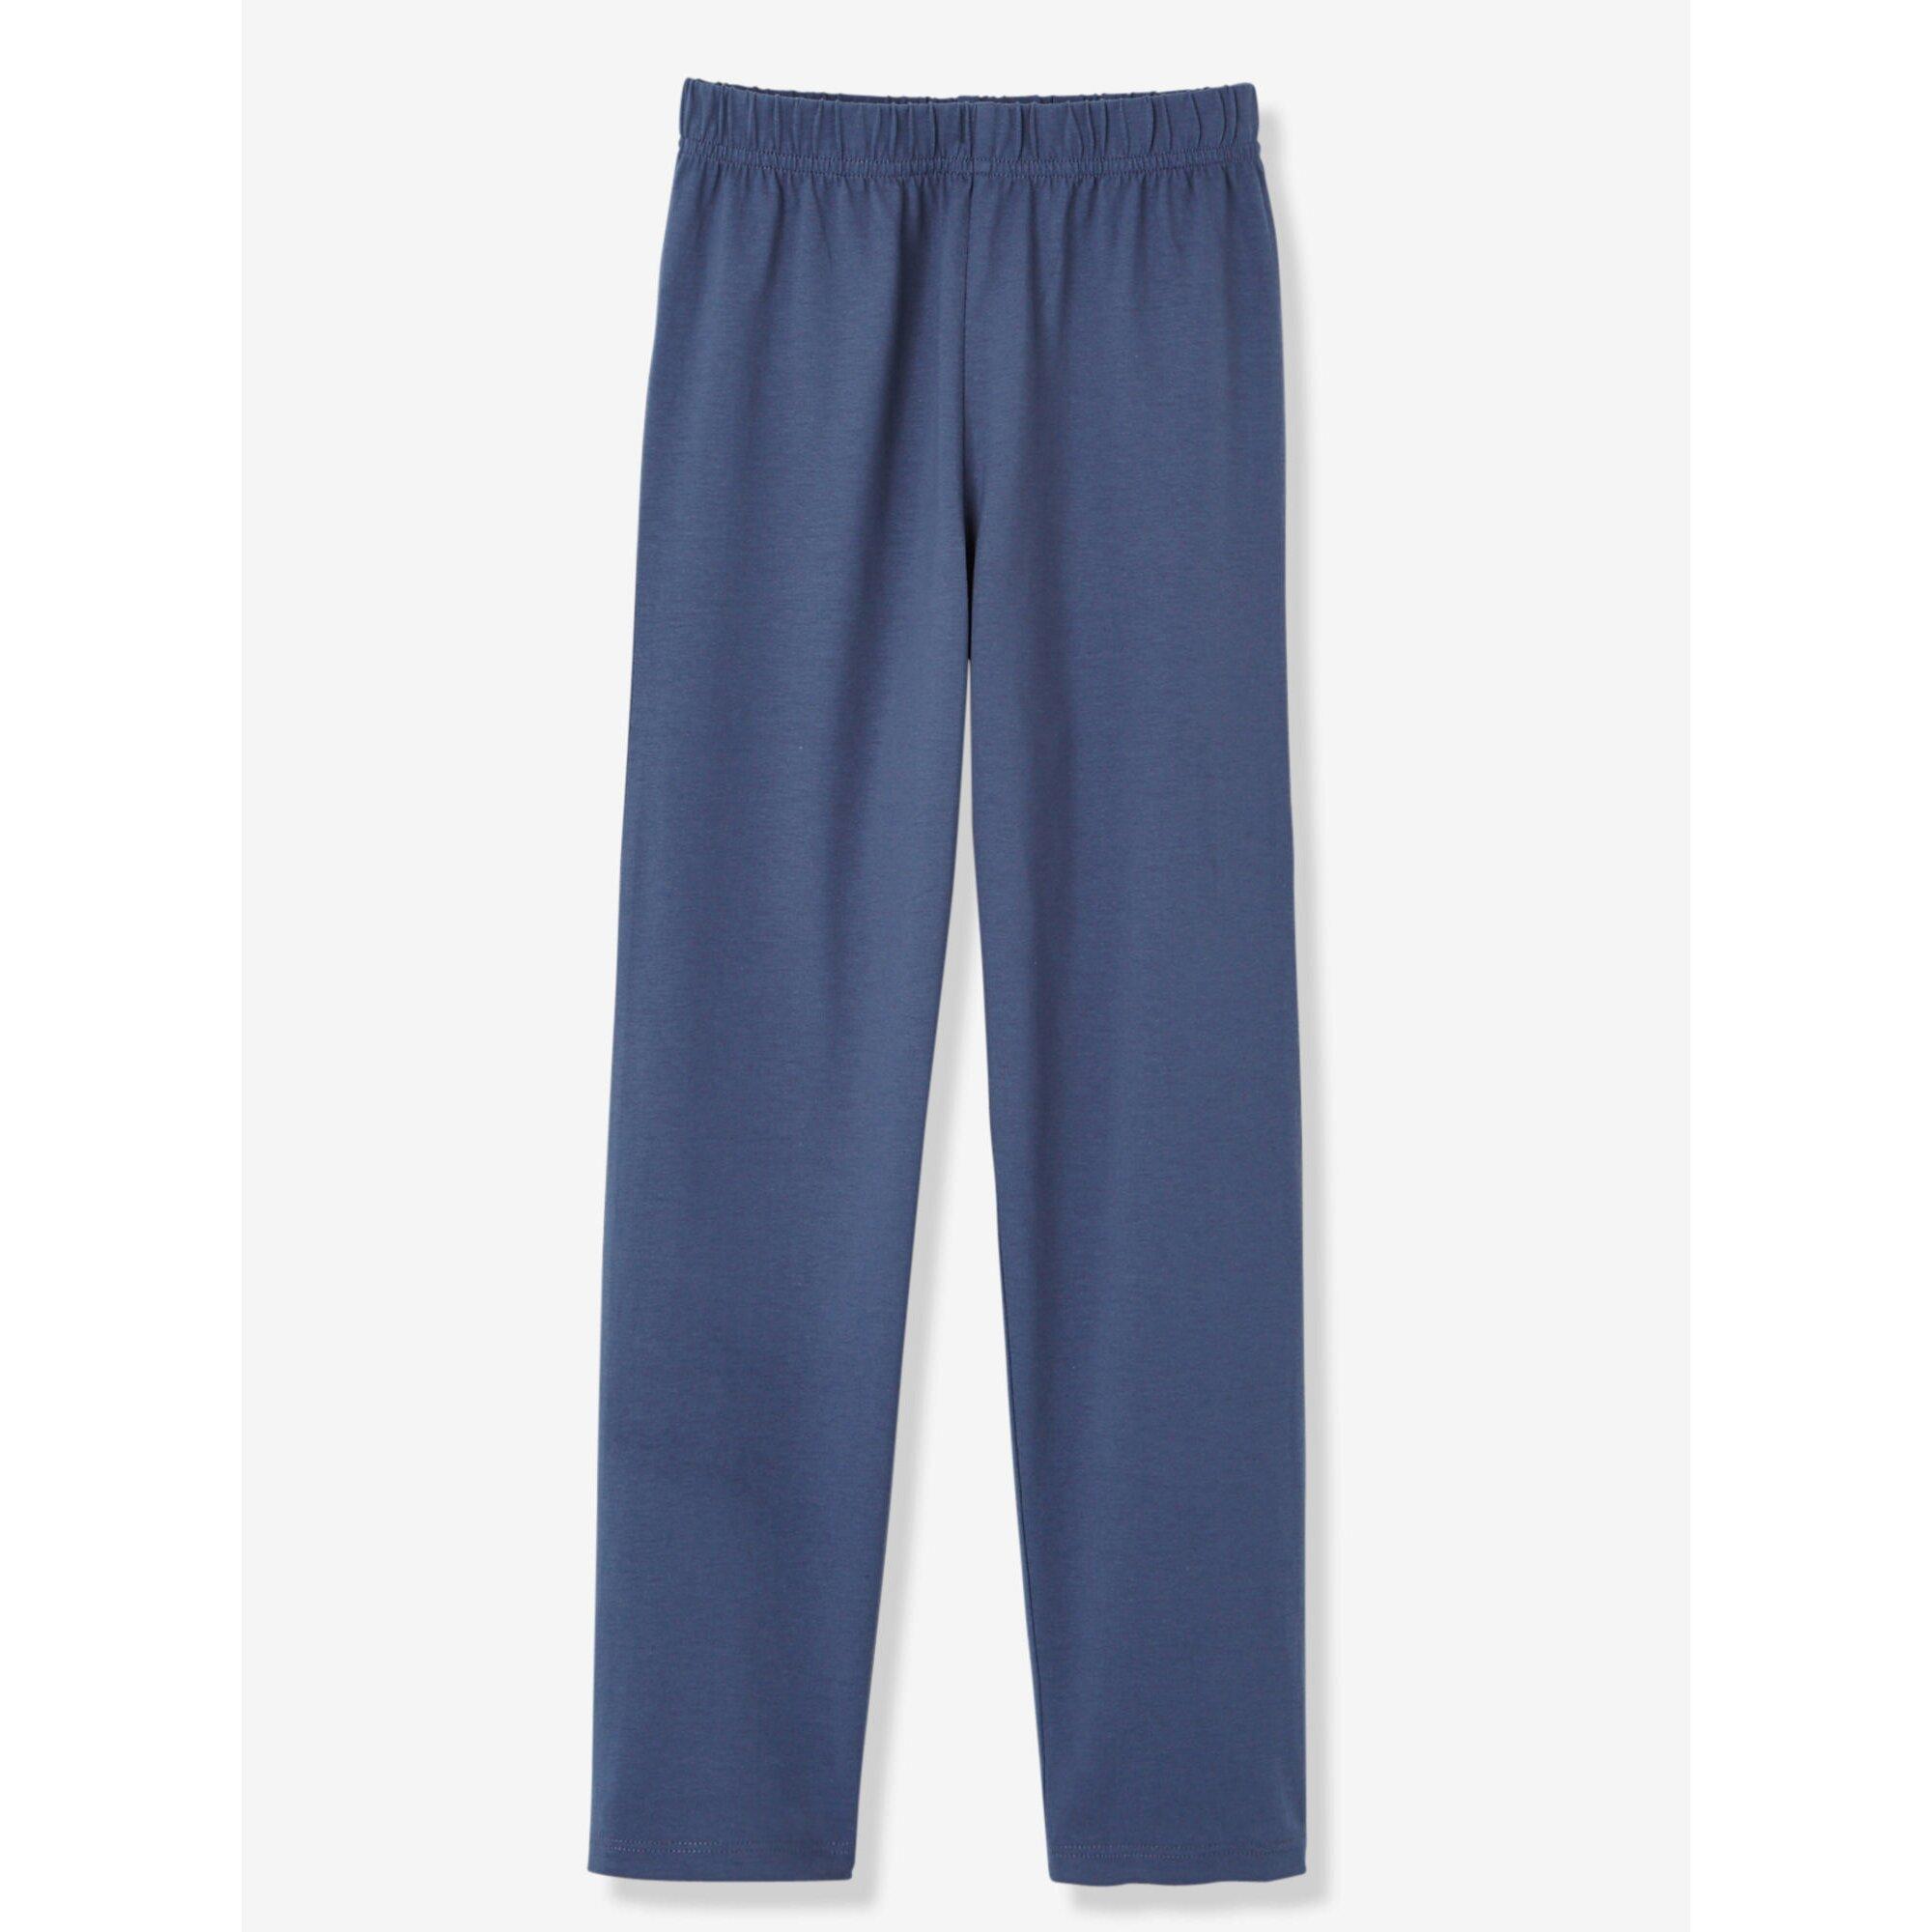 vertbaudet-2er-pack-kombi-pyjamas-fur-jungen